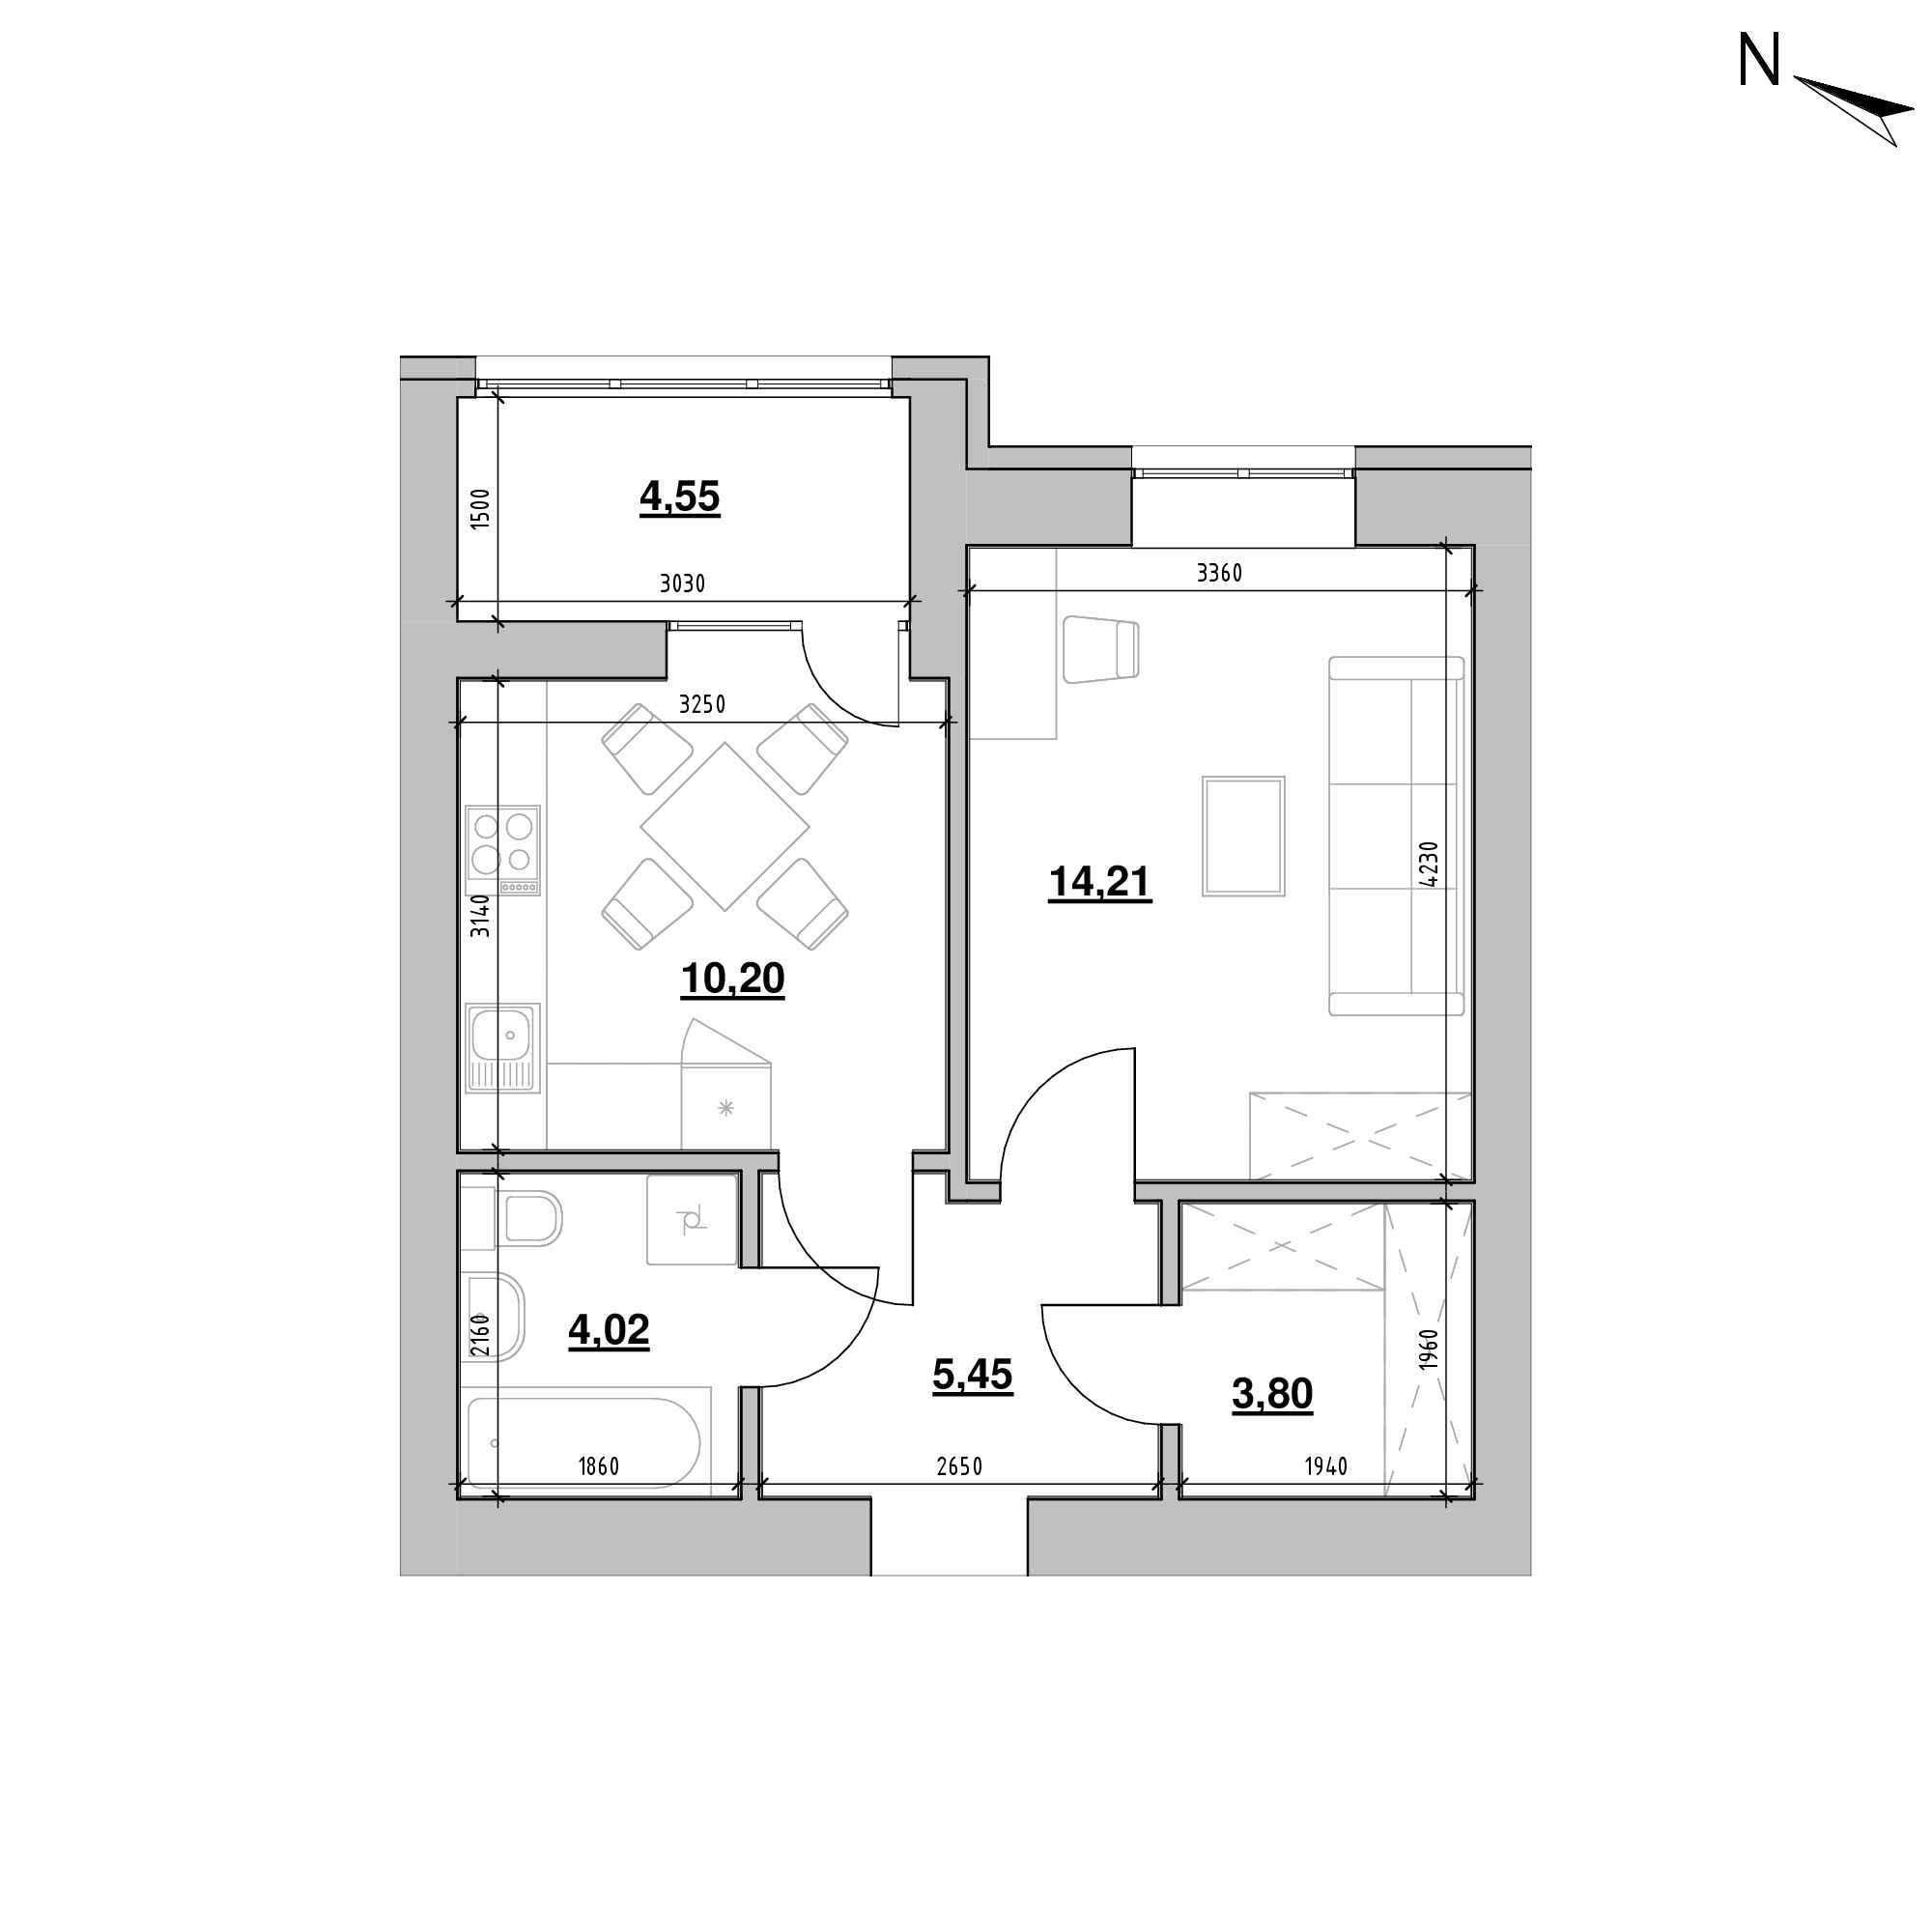 ЖК Шенген: планування 1-кімнатної квартири, №7, 42.23 м<sup>2</sup>